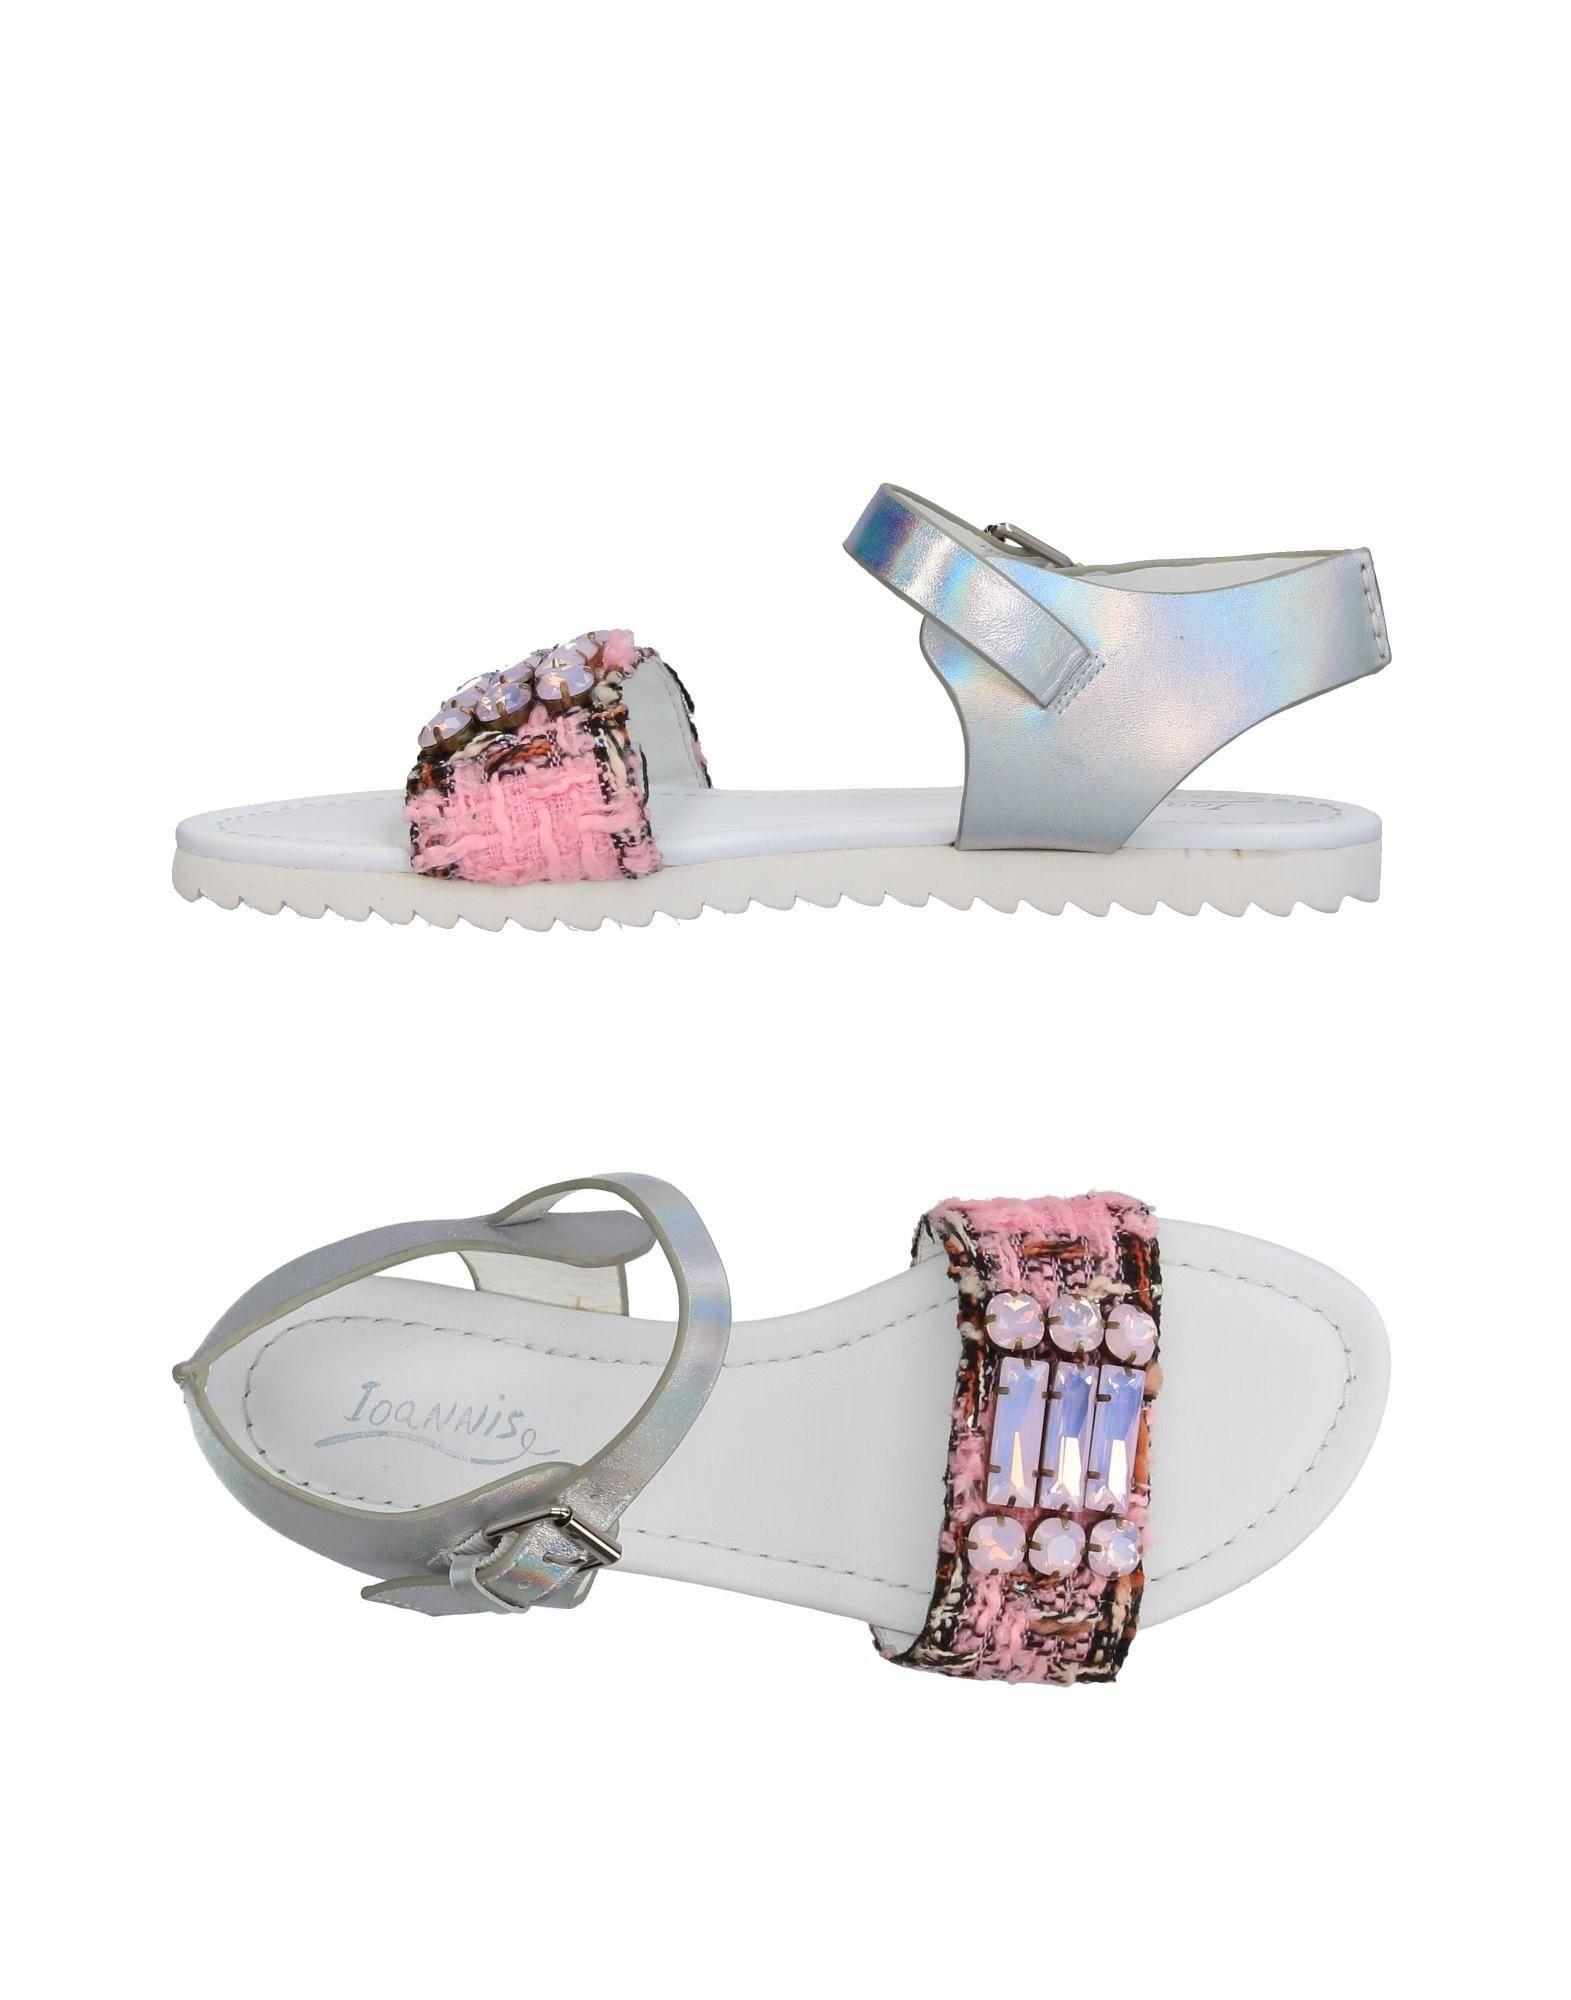 IOANNIS Sandals in Pink